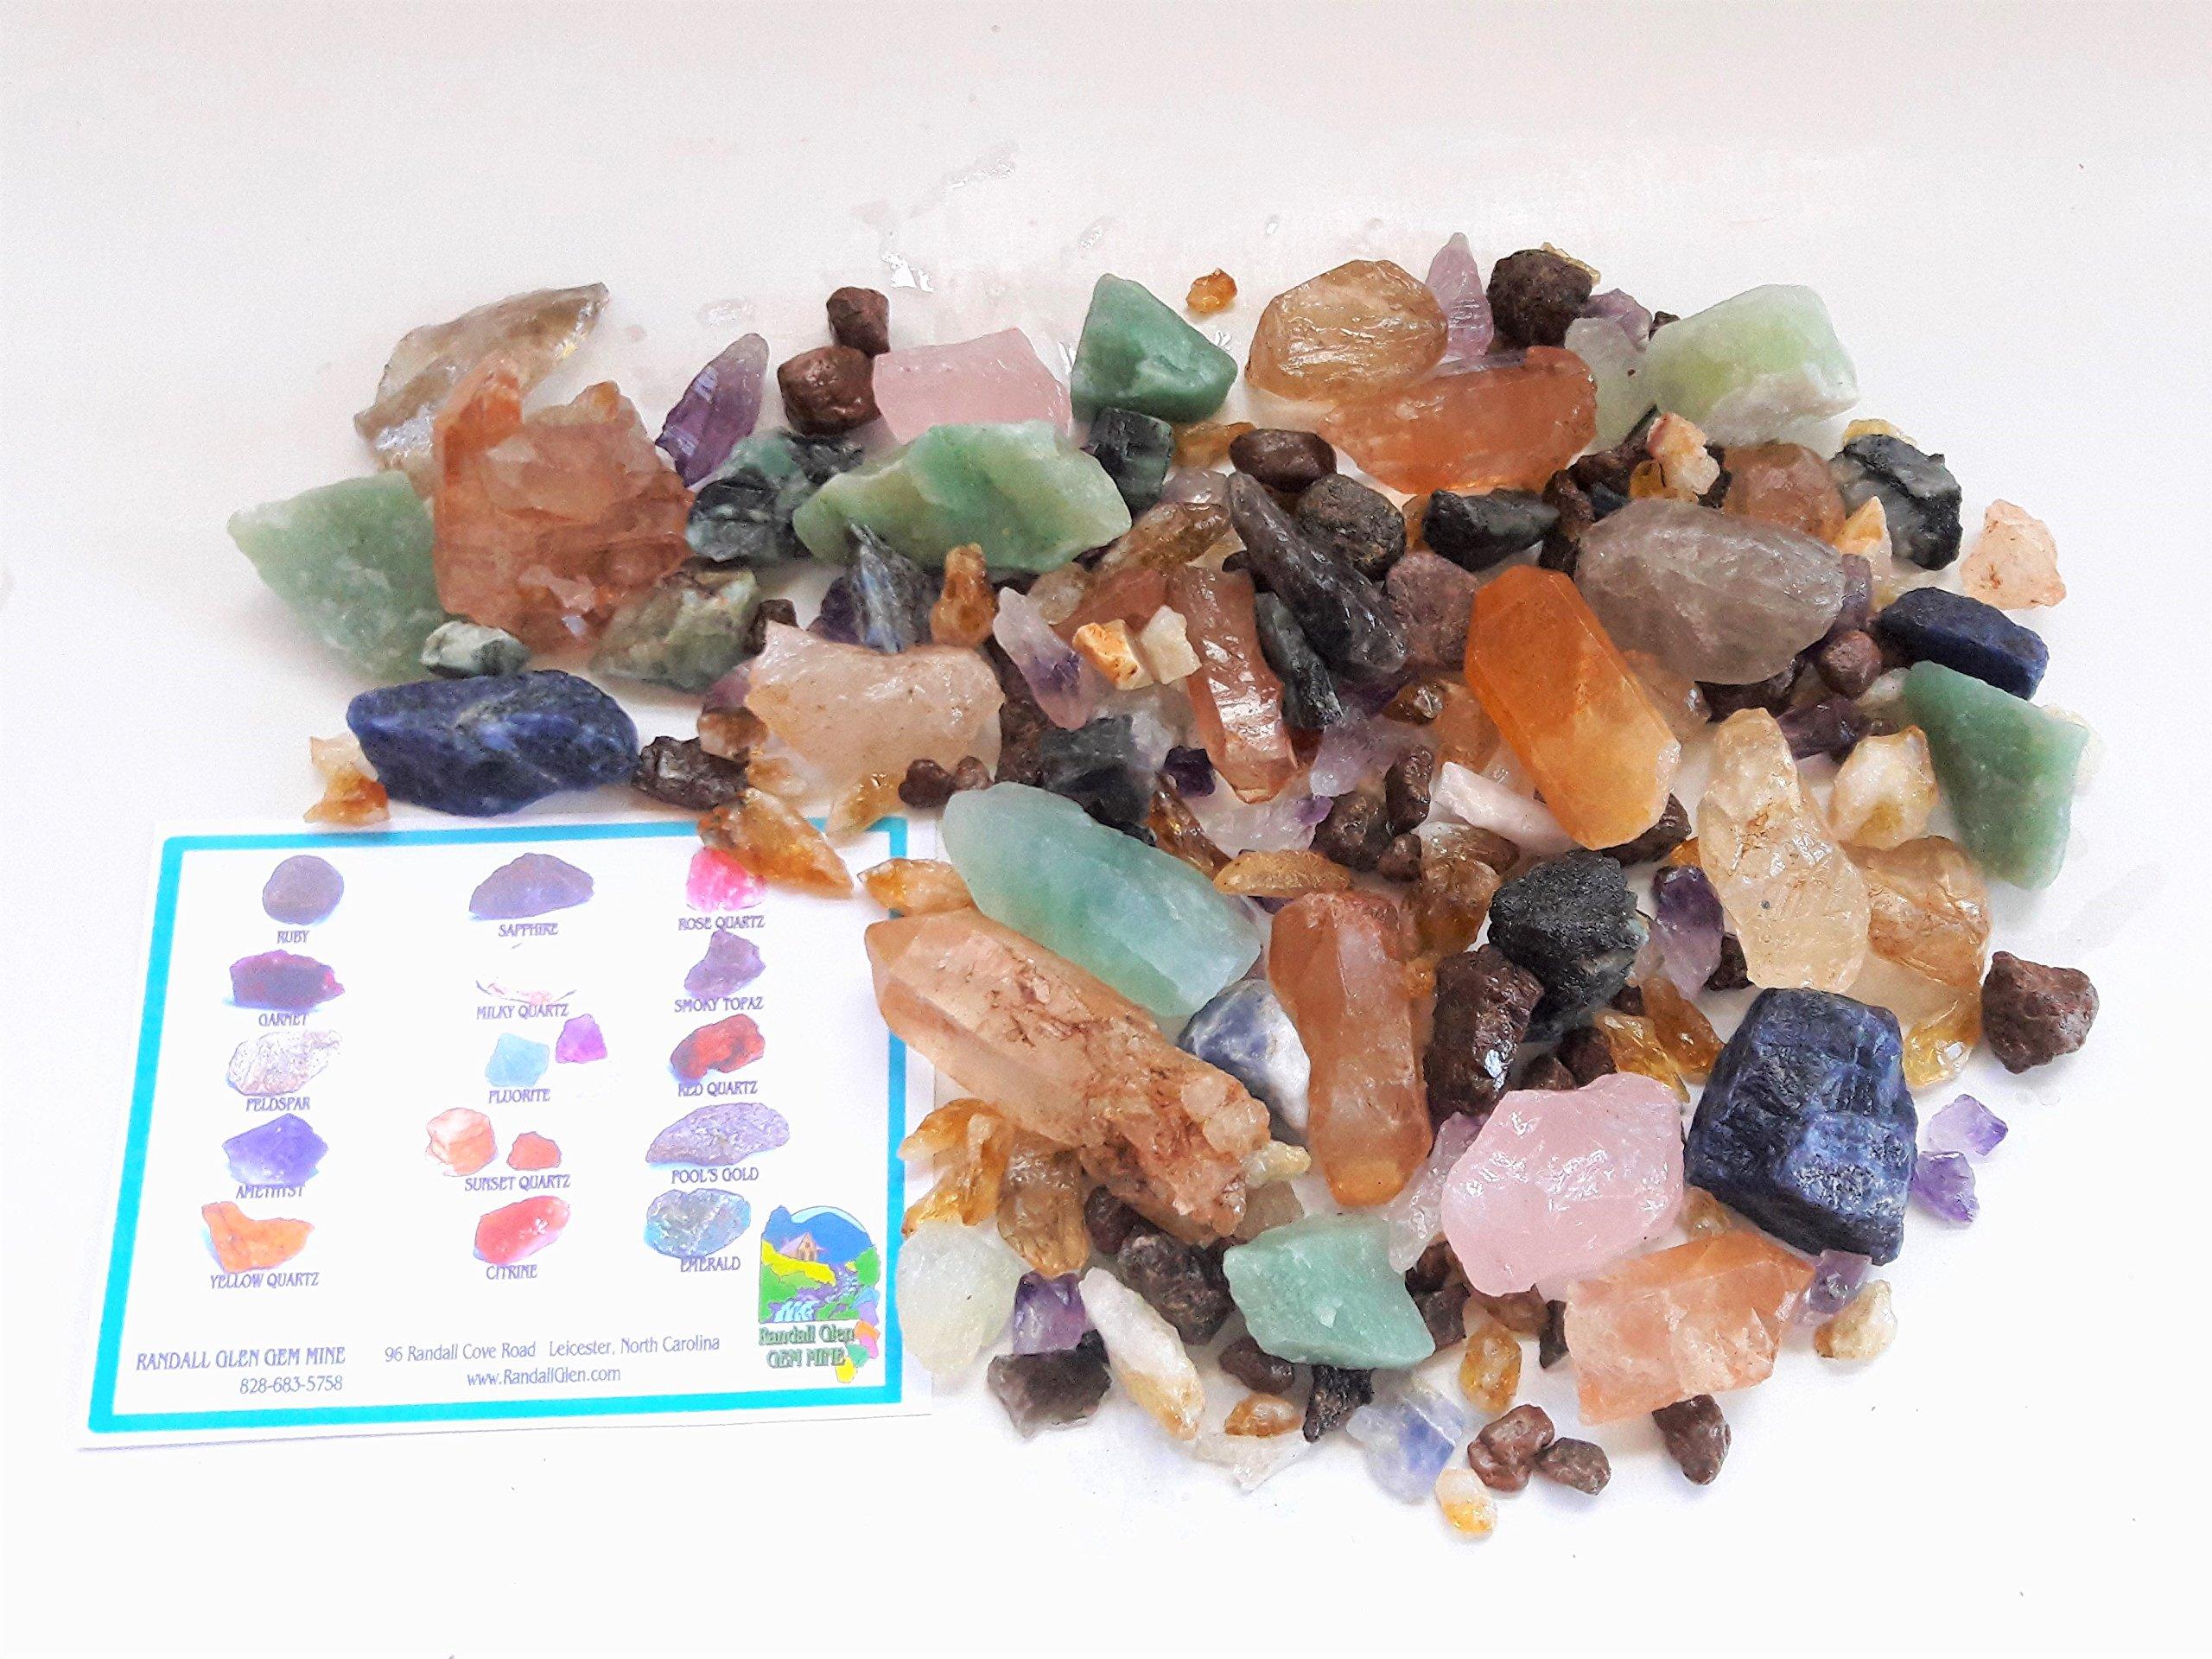 BONANZA TREASURE BOX Home Gem Mining Kit 6500+ Carats of Gems